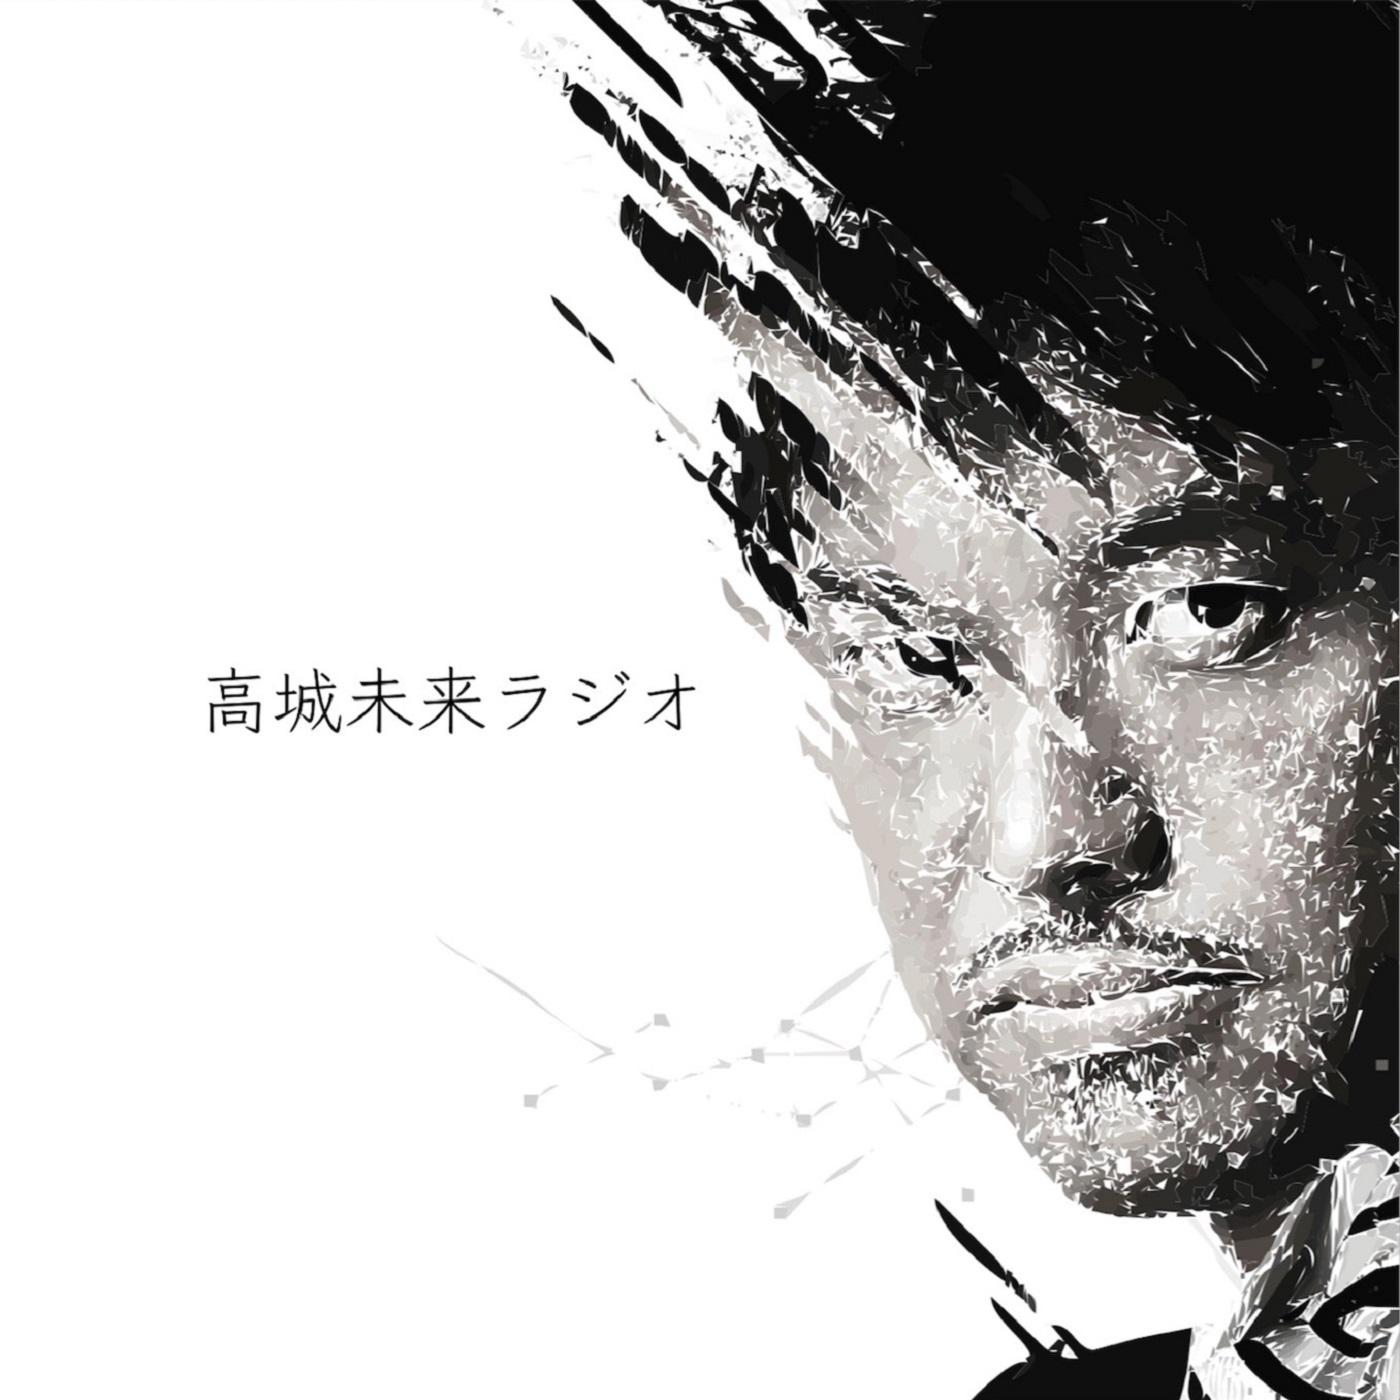 第51回 水面下の領土侵攻 -宮本雅史さん/産経新聞社編集委員 後編